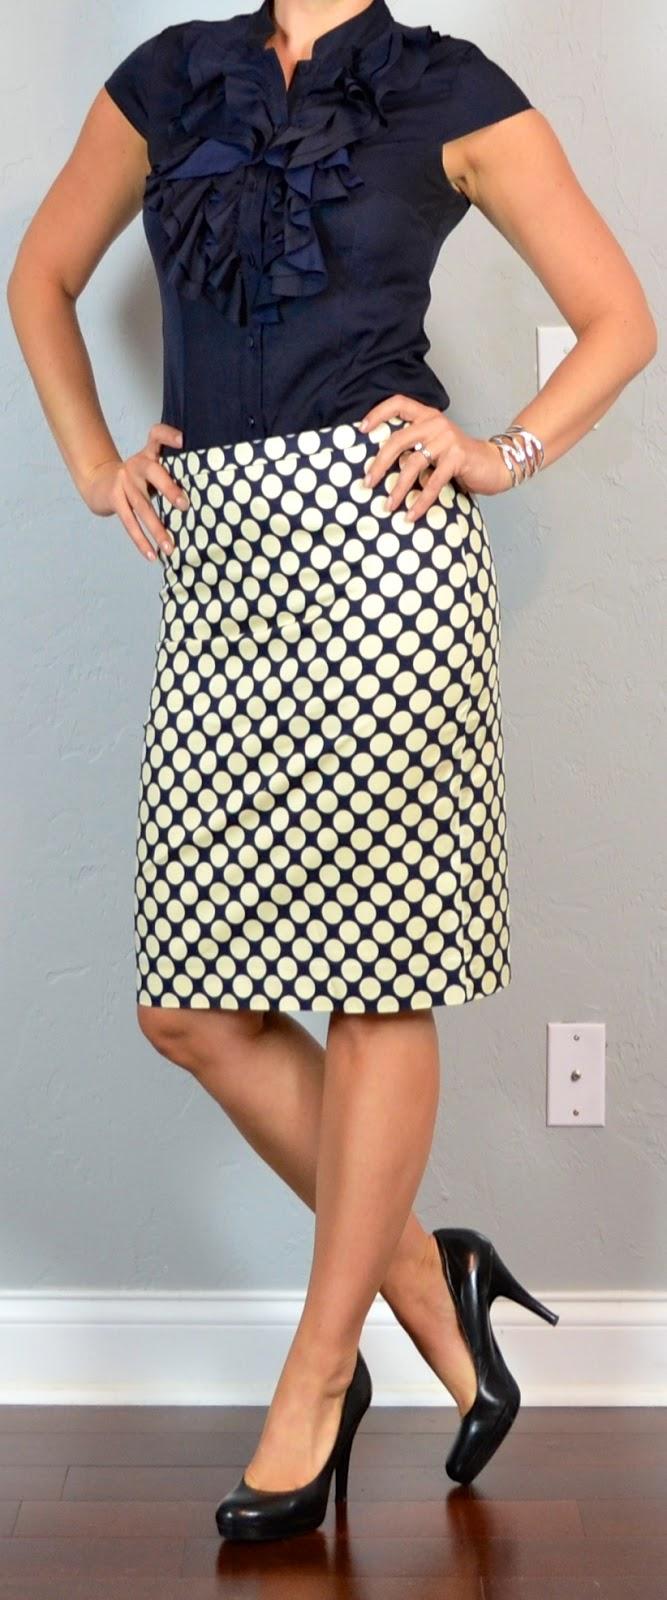 Outfit post navy ruffle blouse polka-dot pencil skirt black pumps